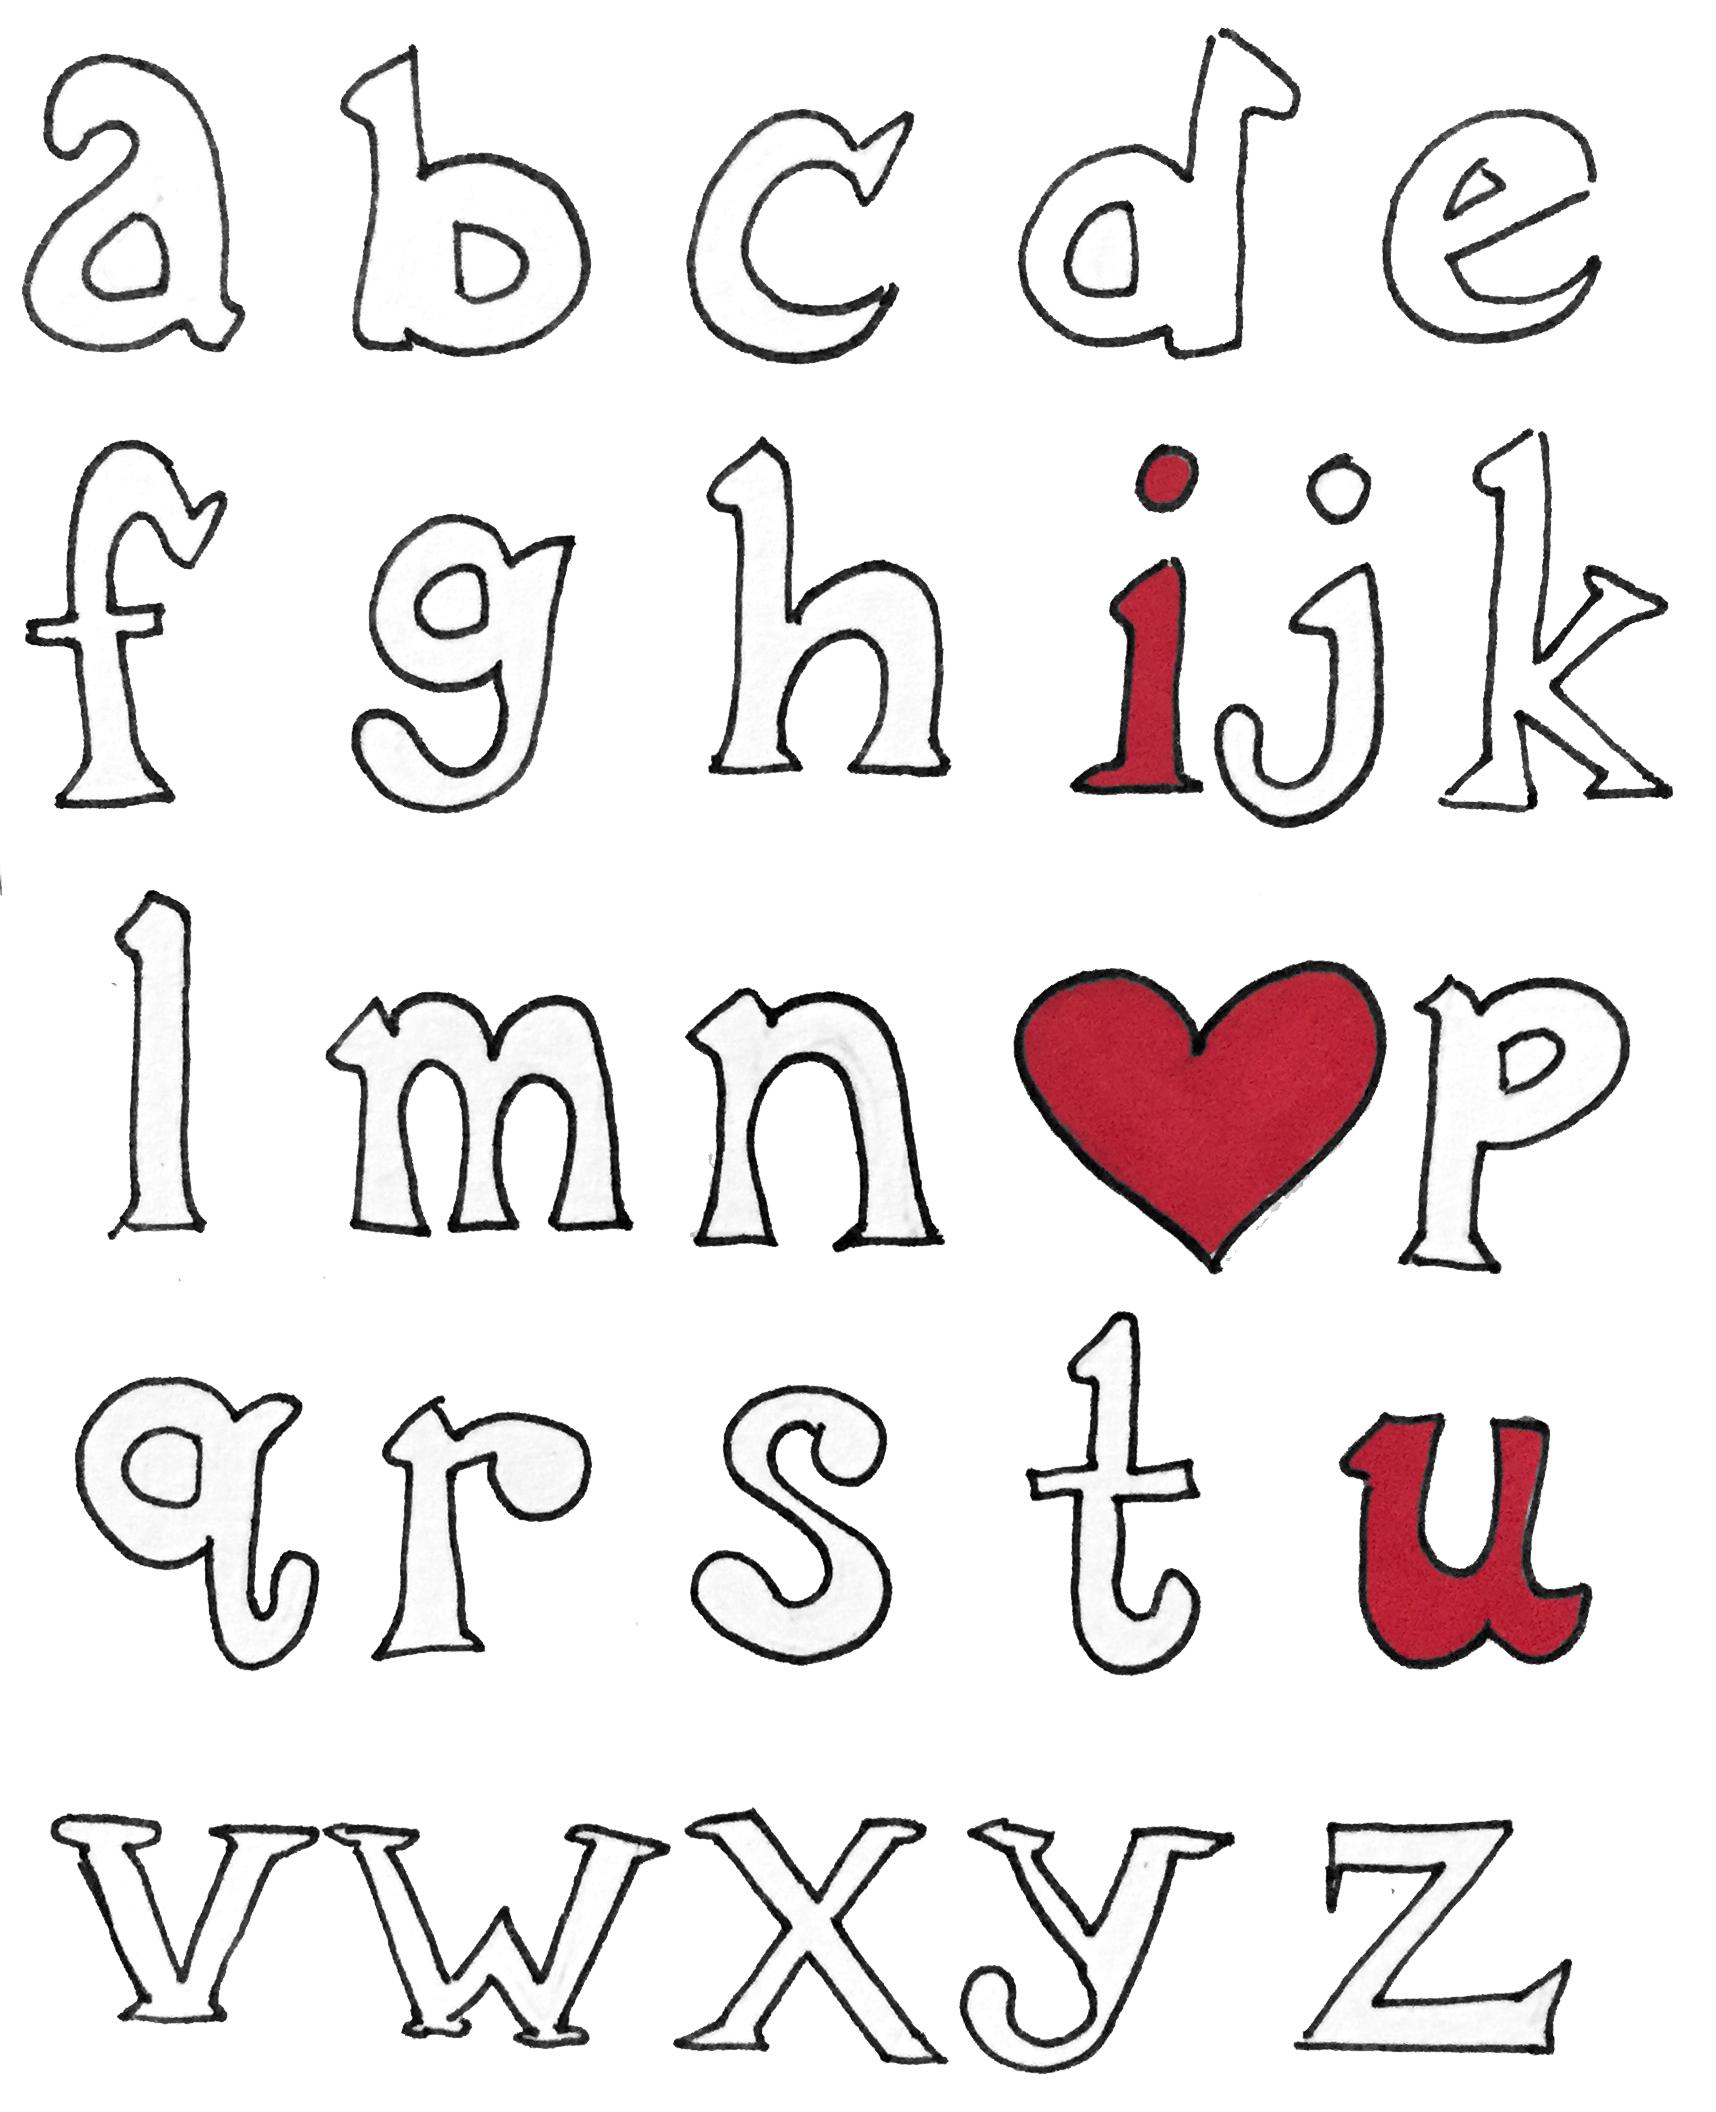 I_Heart_U